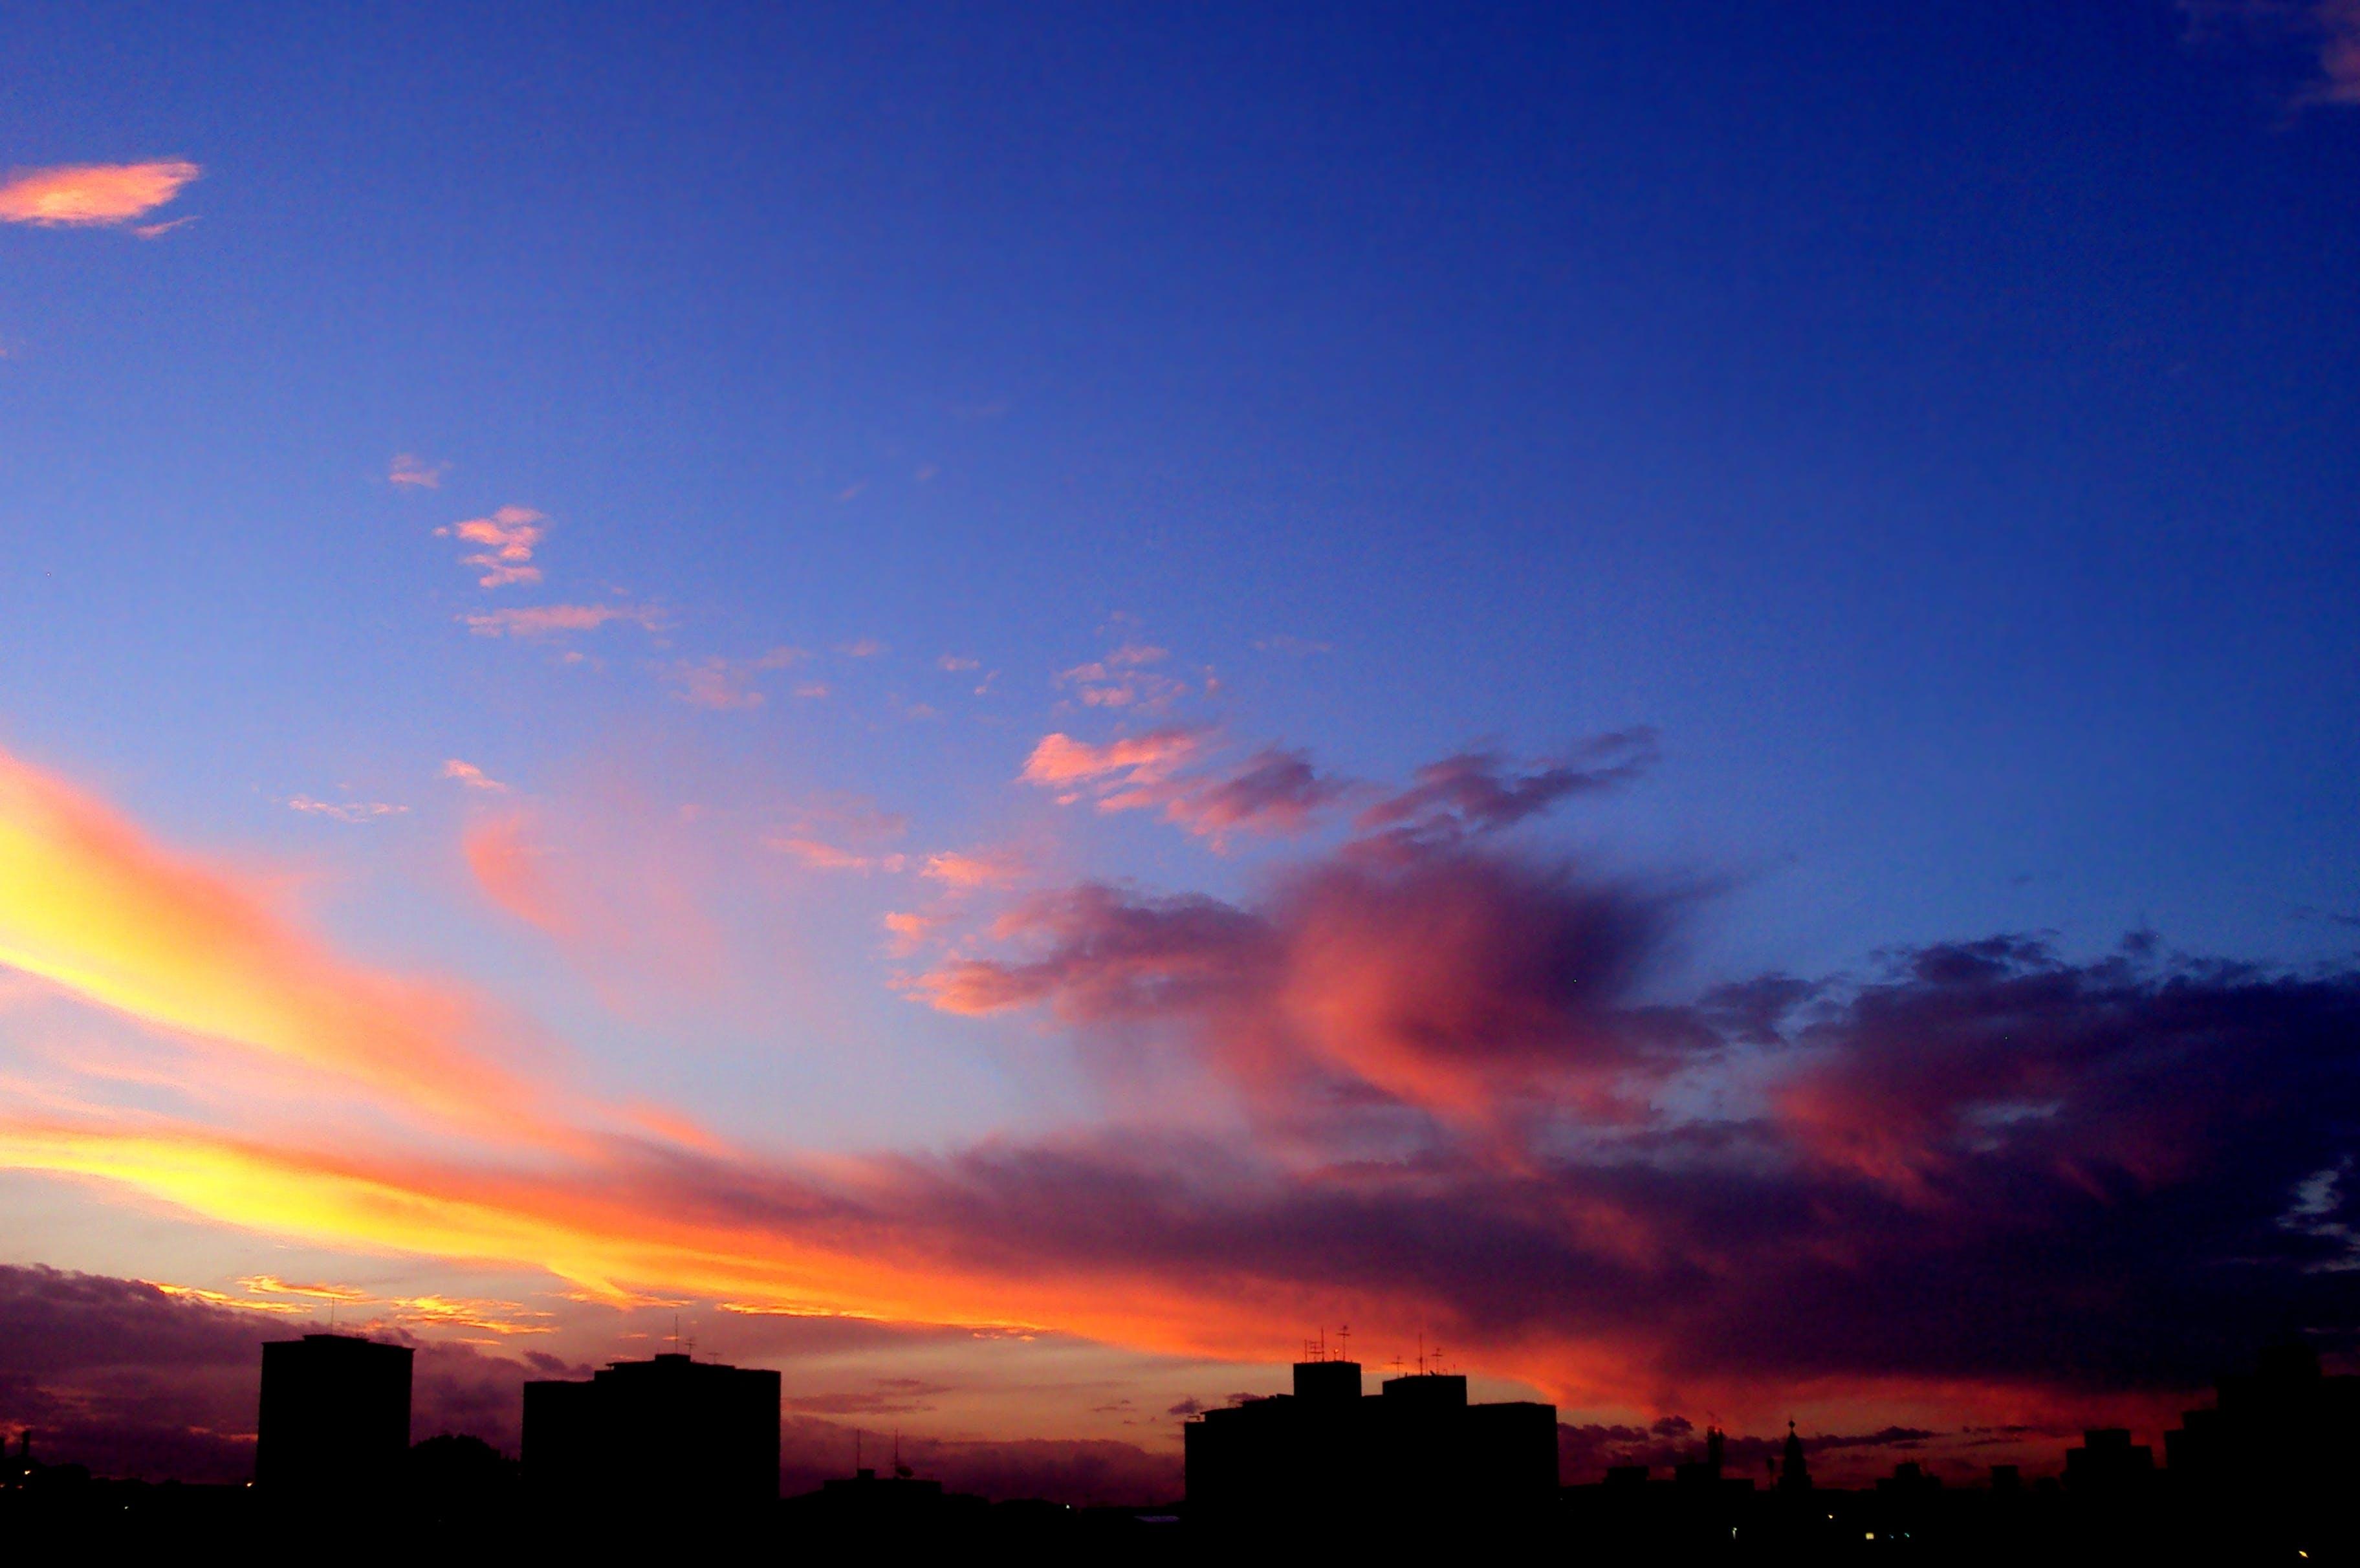 céu, nuvens, poente